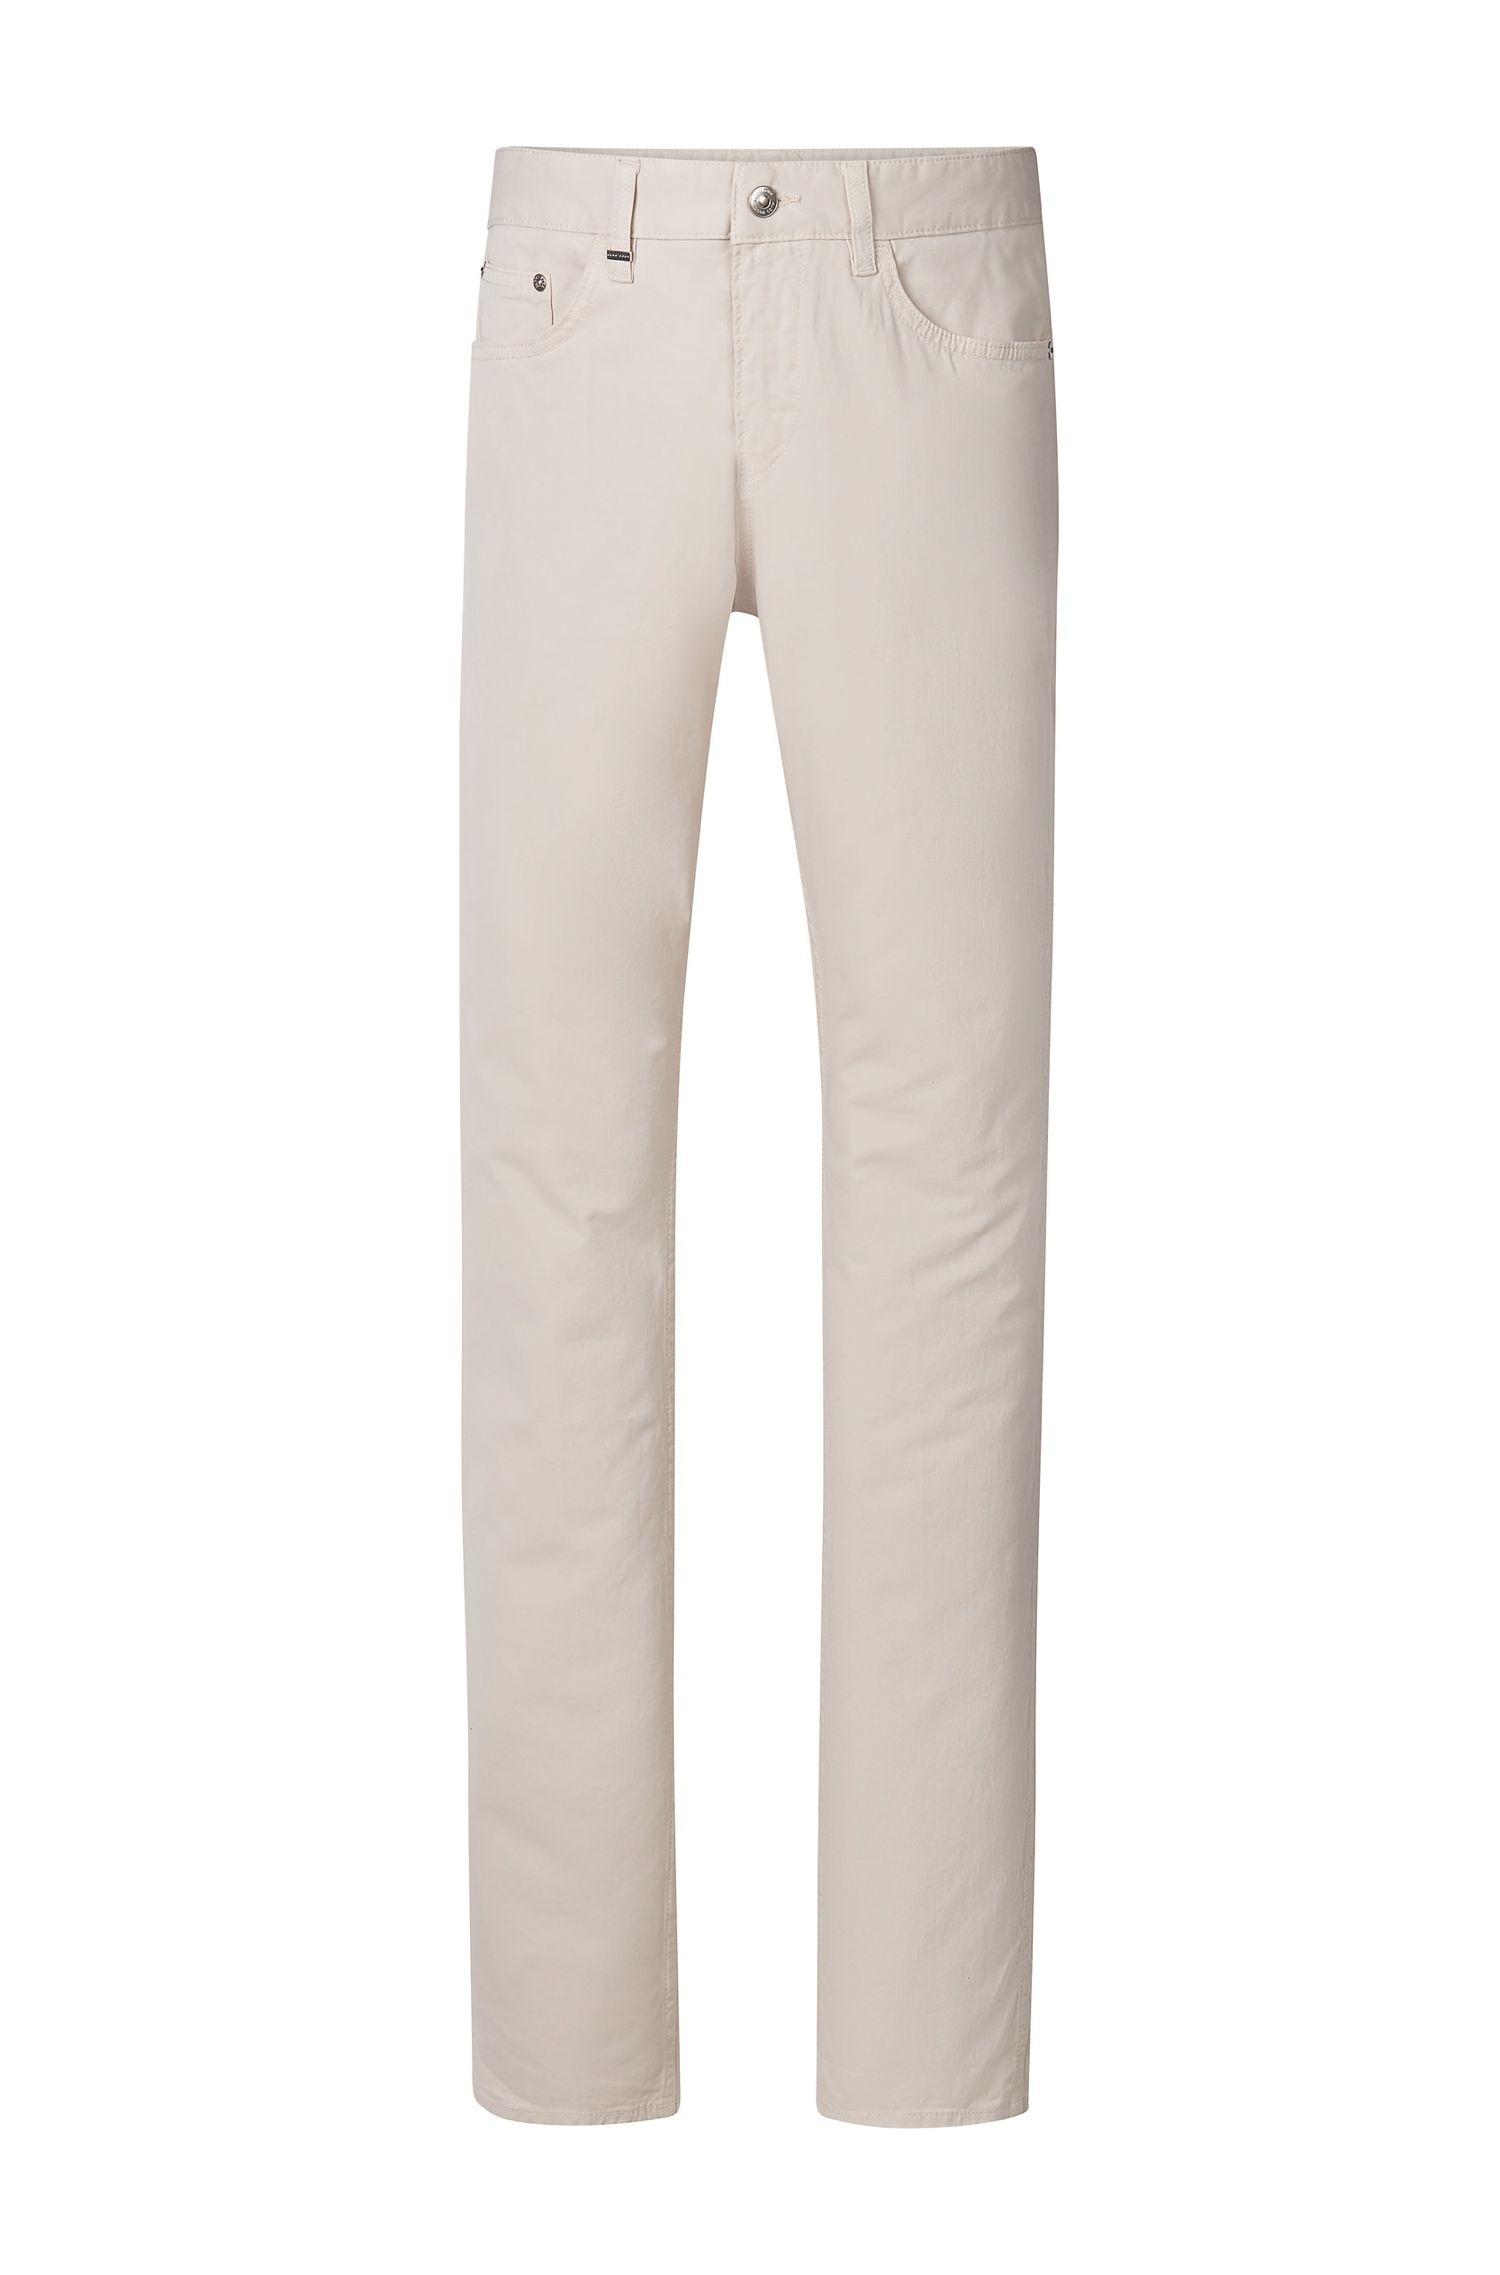 13 oz Stretch Cotton Jeans, Slim Fit | Delaware